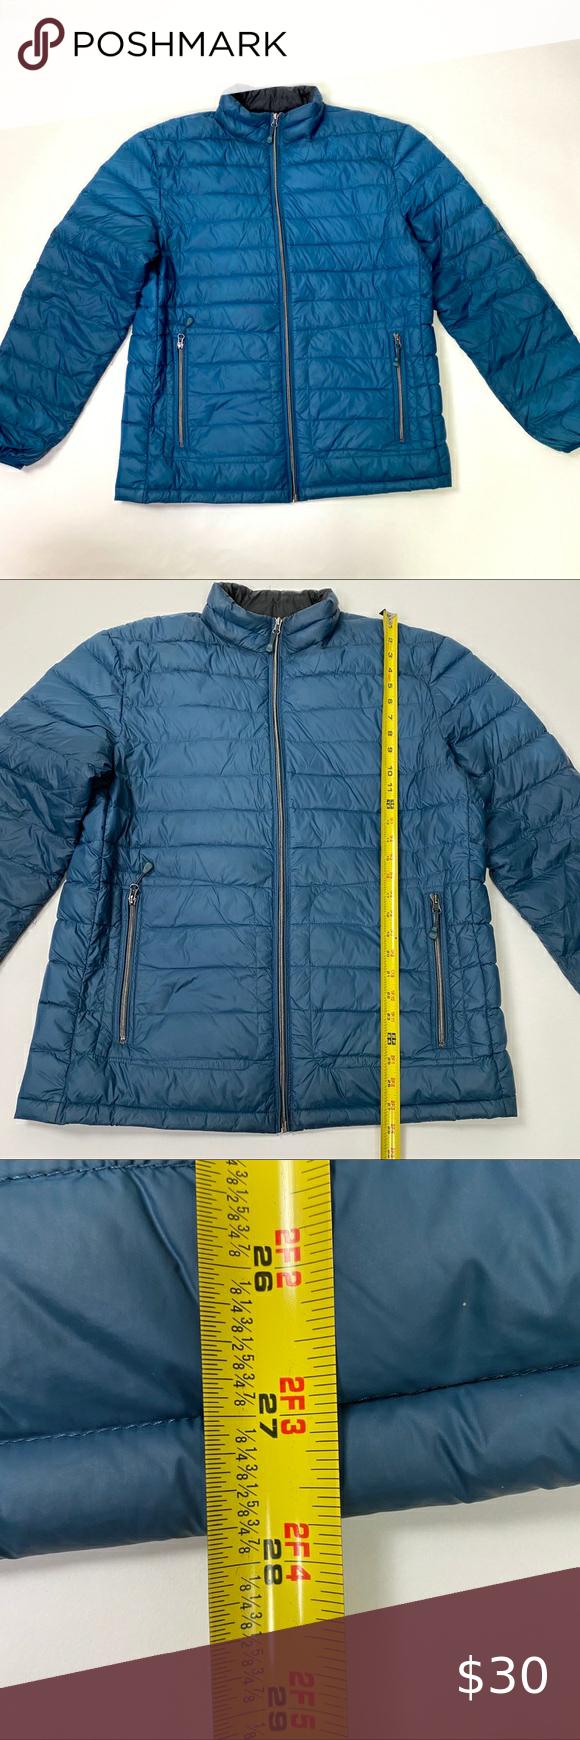 Buffalo David Bitton Jacket Size L Clothes Design Jackets Fashion [ 1740 x 580 Pixel ]